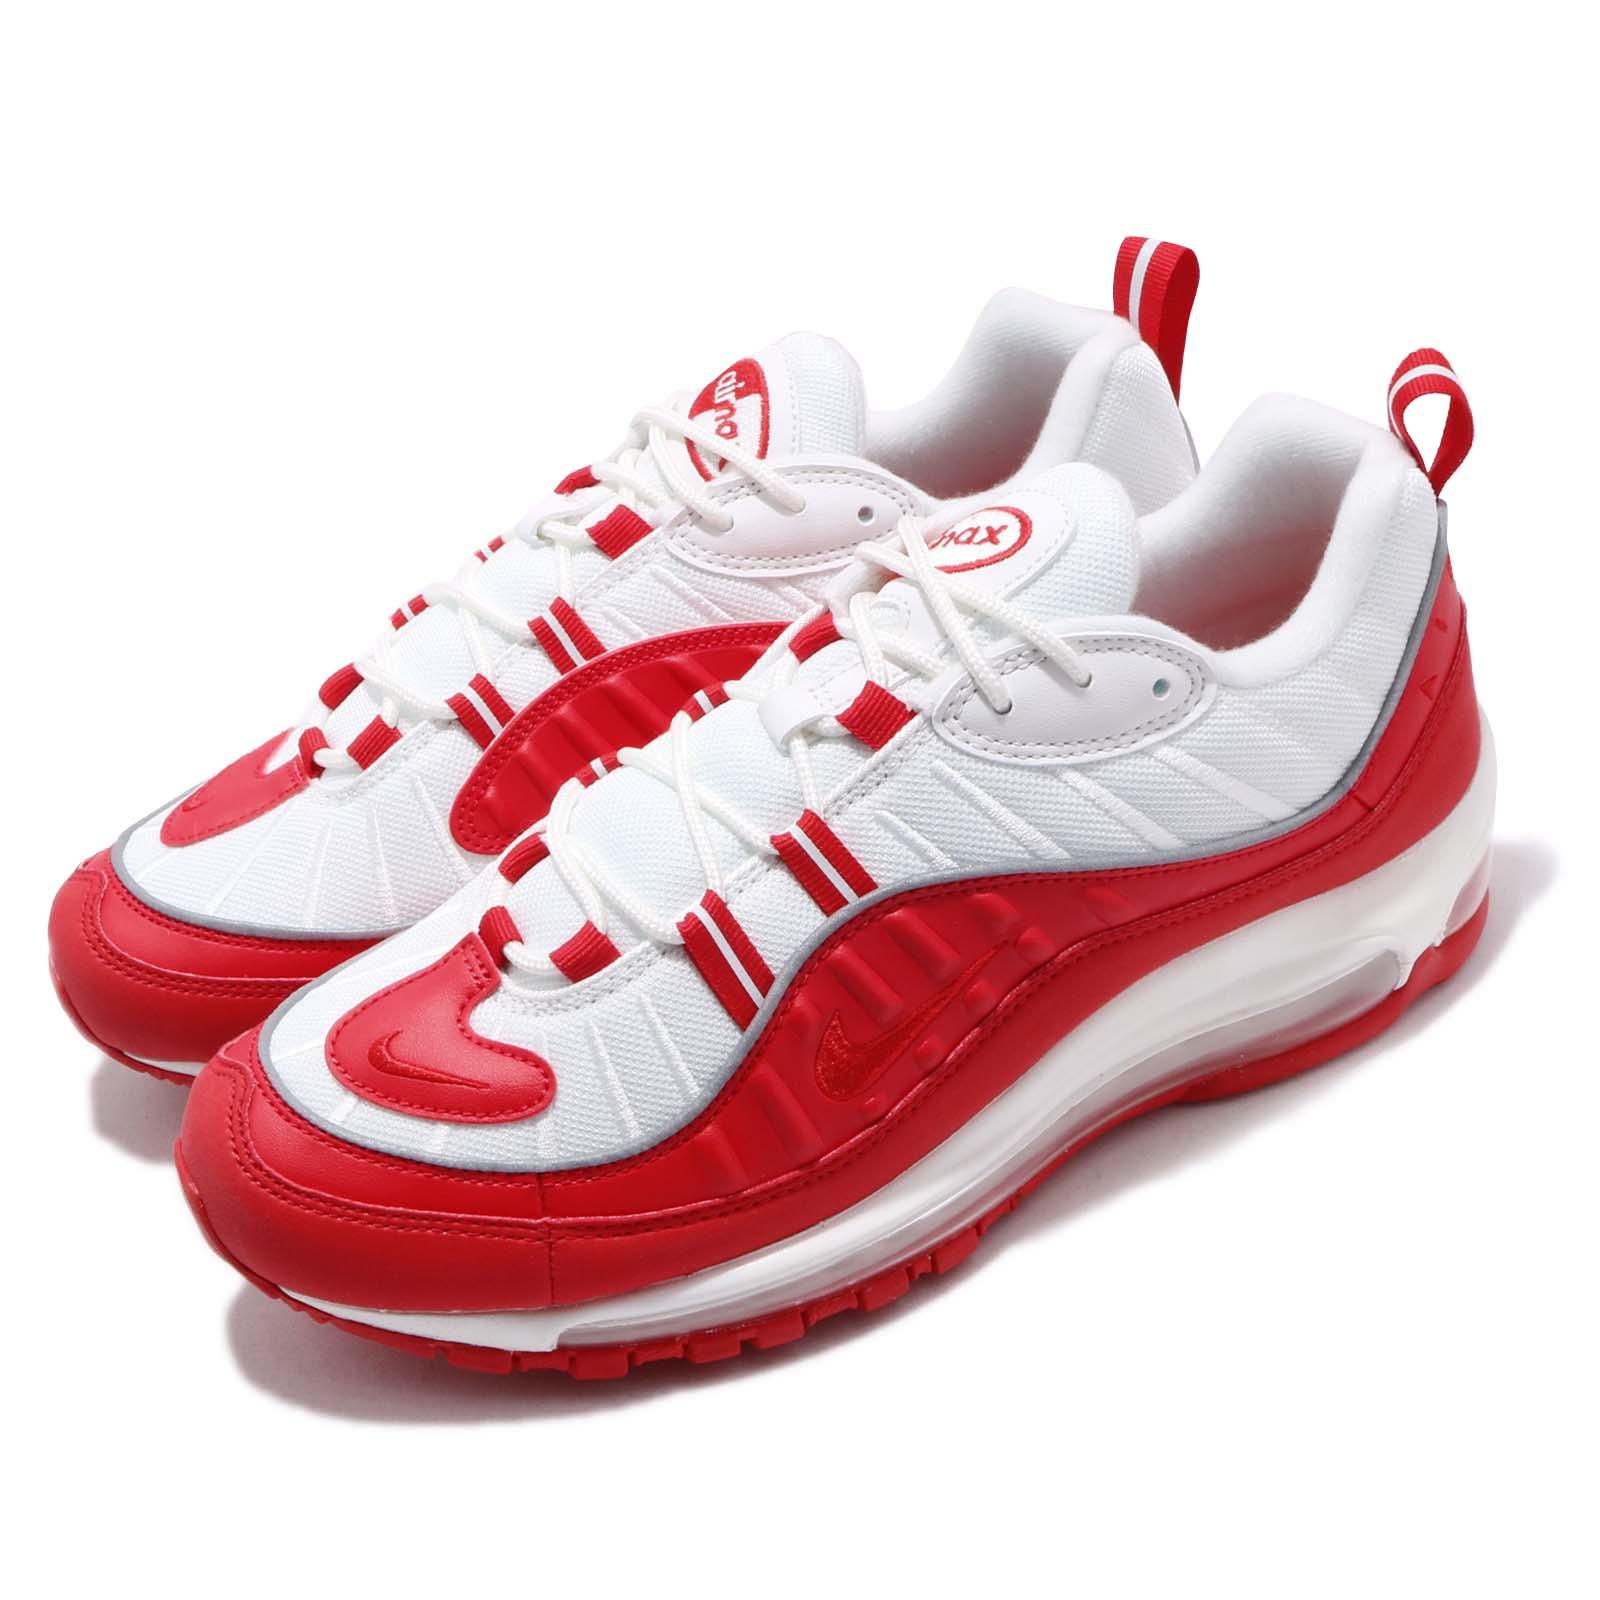 Nike 休閒鞋 Air Max 98 男女鞋 640744-602